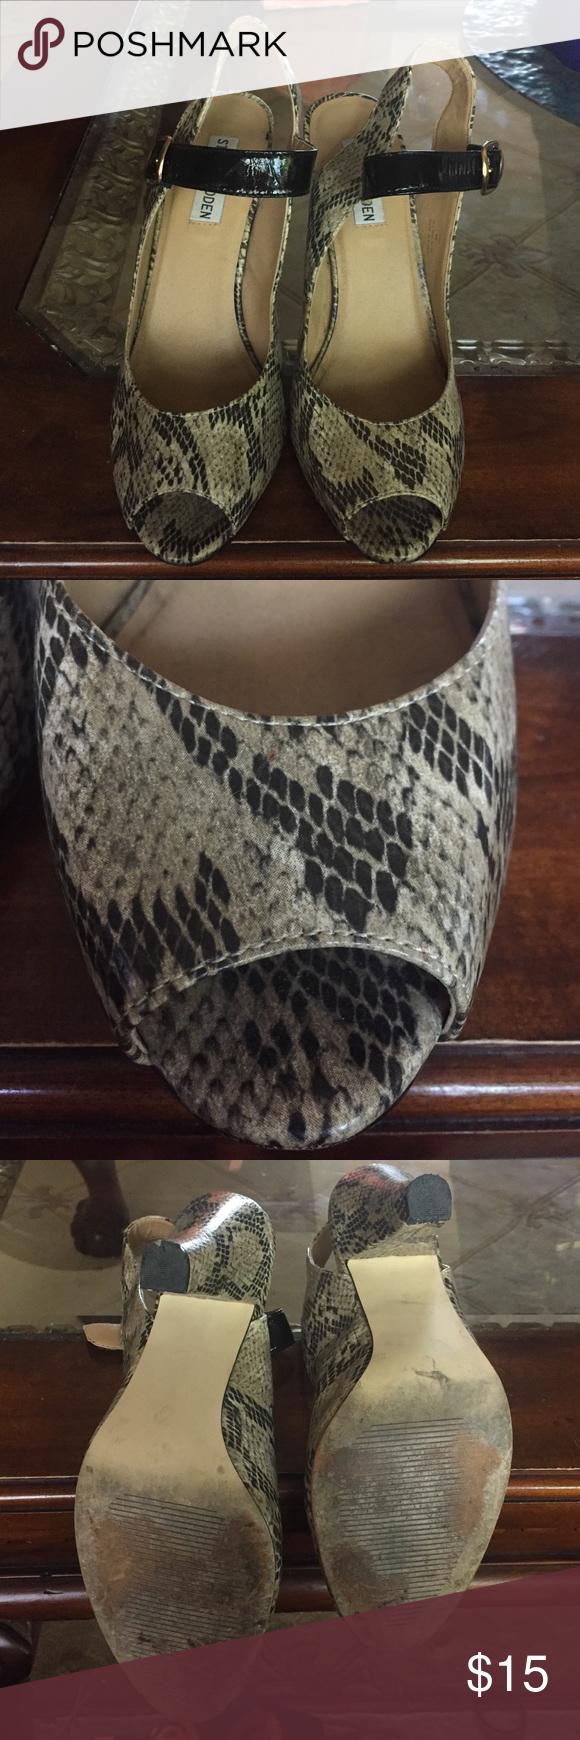 Steve Madden snakeskin heels Snakeskin heels by Steve Madden. Black shiny buckle. 4 in heel. I always take offers! =) Steve Madden Shoes Heels